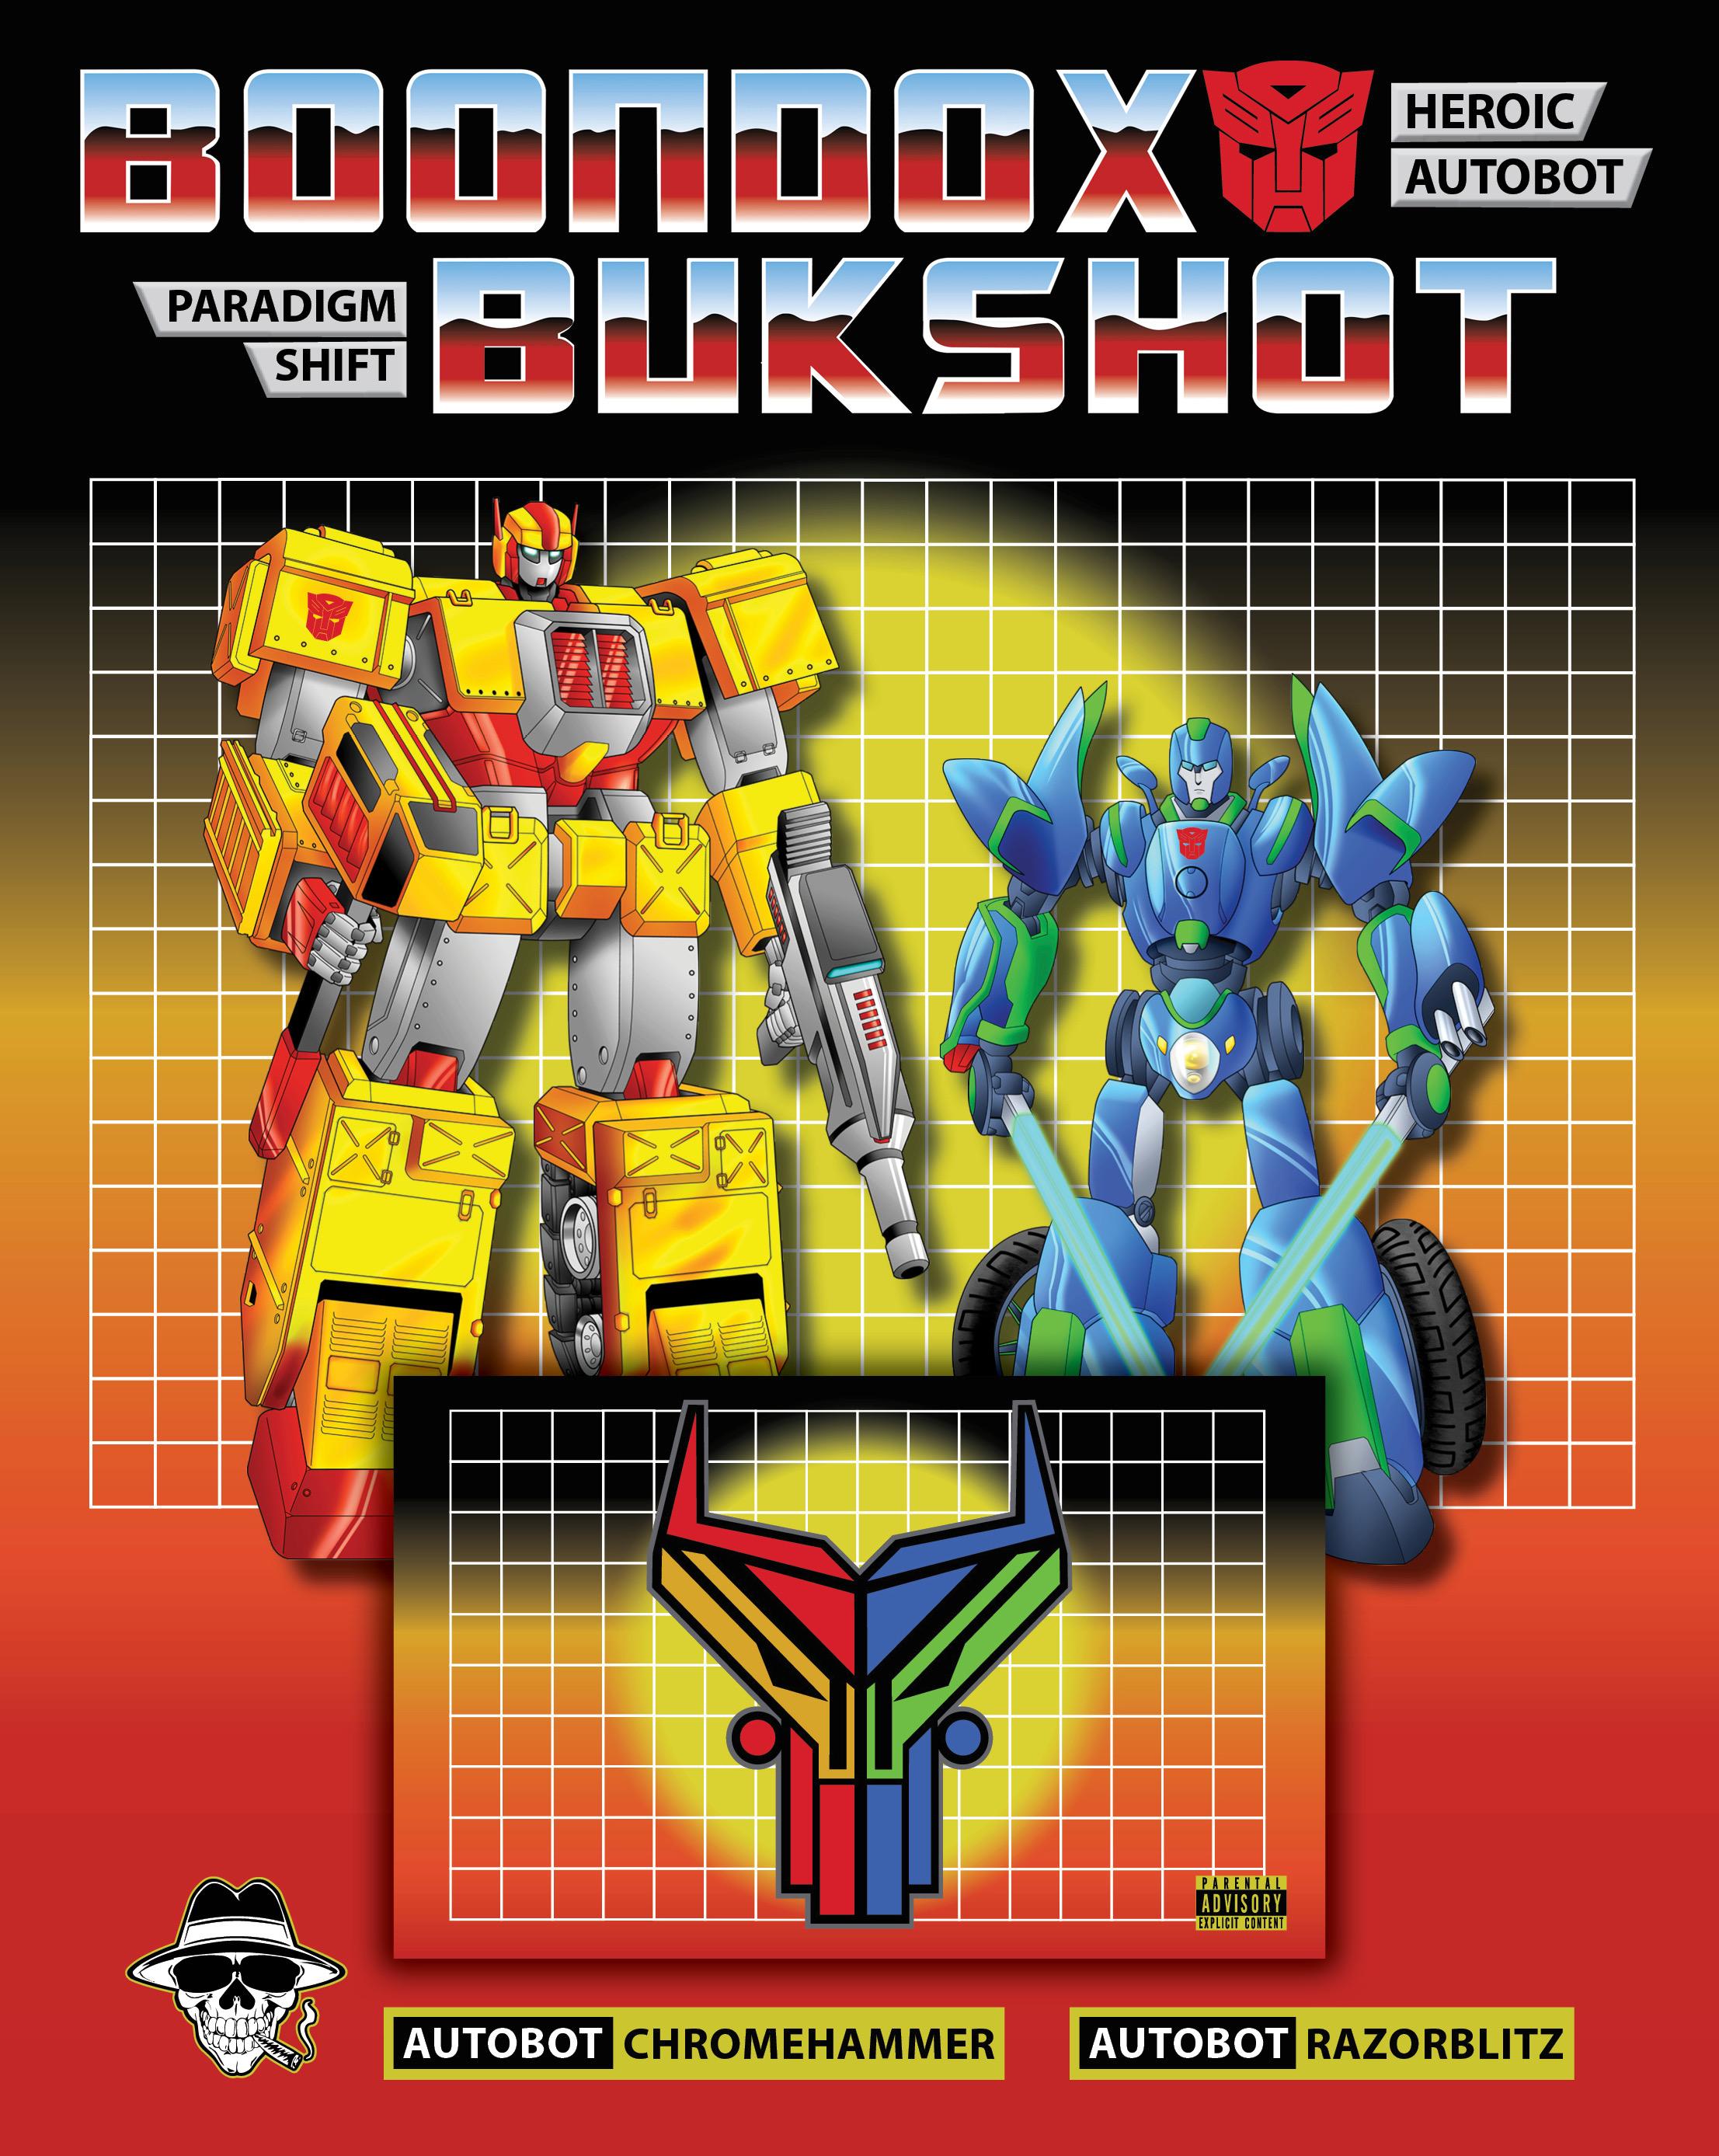 "Boondox X Bukshot ""Paradigm Shift"" Collectible Cassette Pack! AUTOBOT Version! (LIMITED To 25!)"